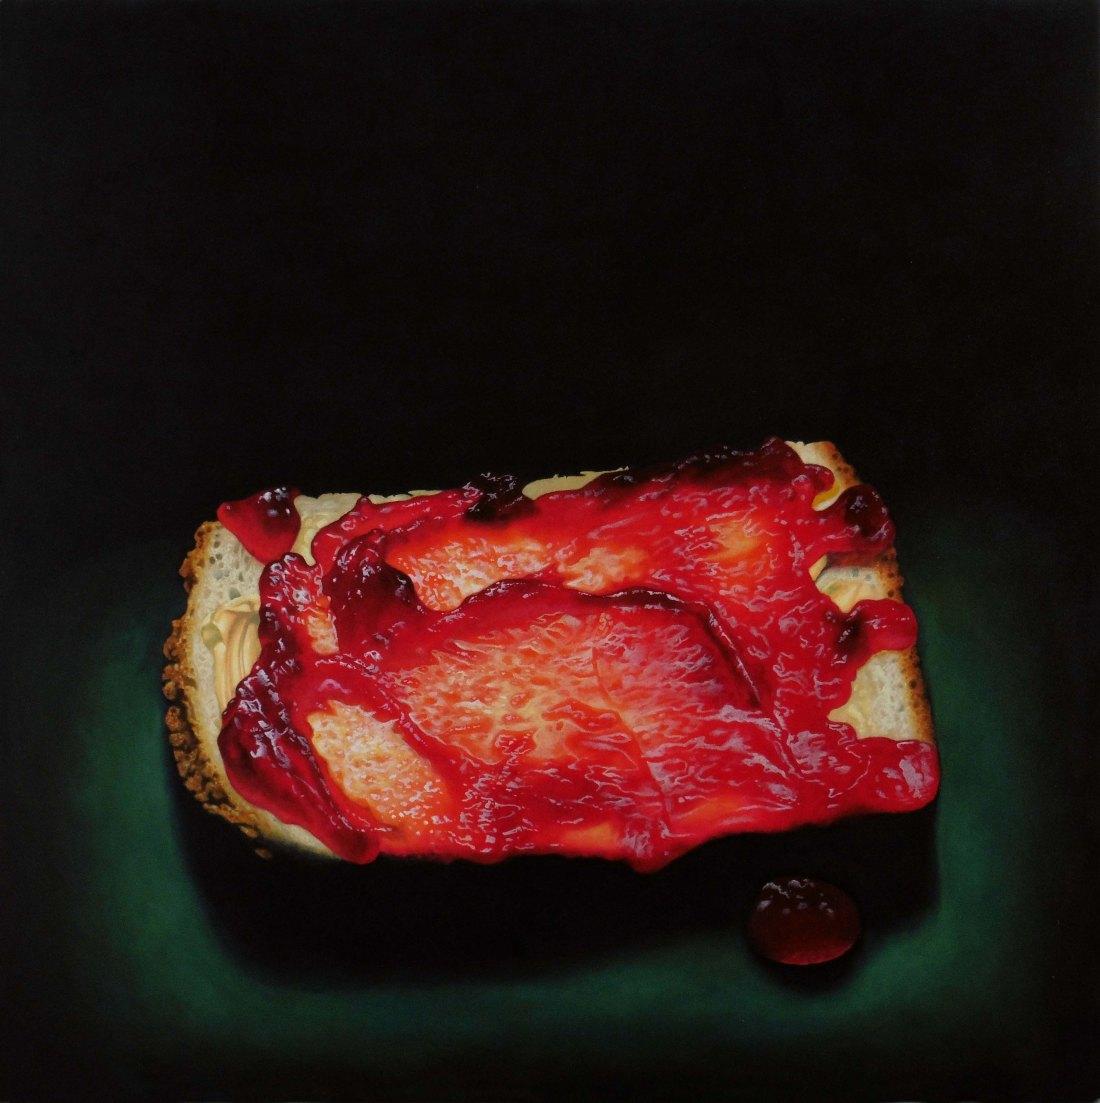 post BIG JAM PIECE 2 Oil on Canvas 5x5ft James McDonald 2015